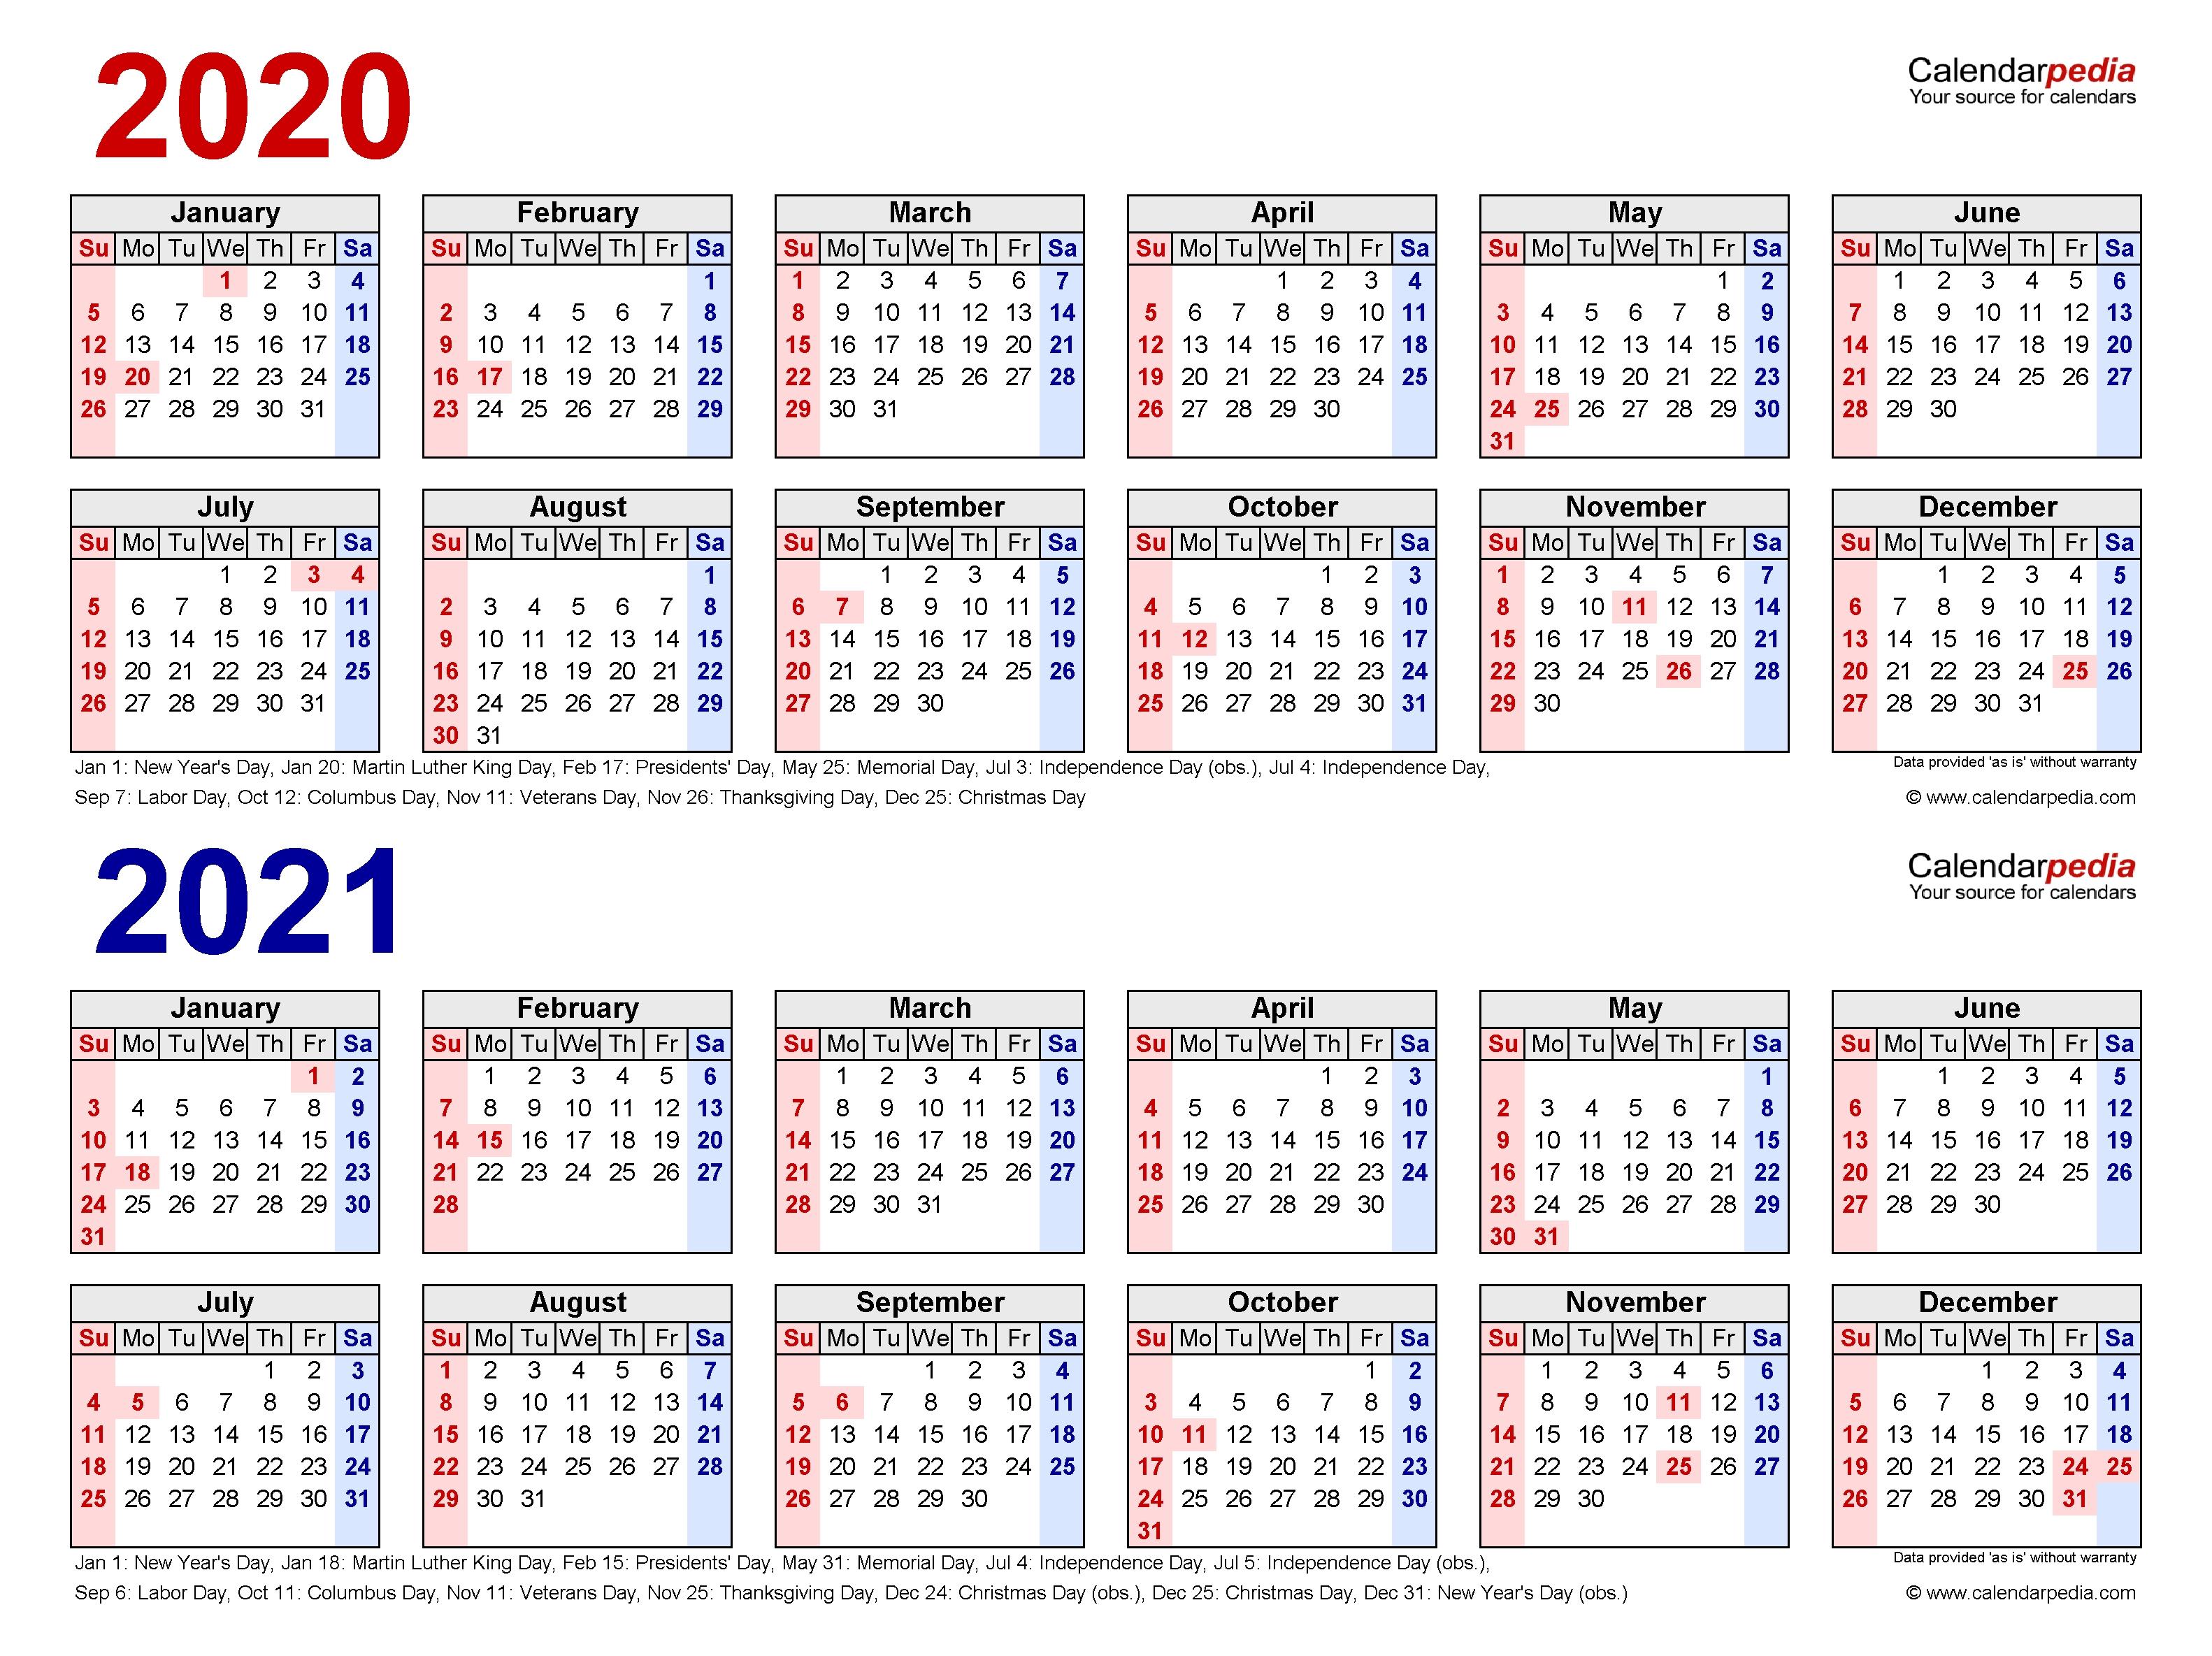 2020-2021 Two Year Calendar - Free Printable Pdf Templates  Free Printable Yearly Calendar 2021 2020